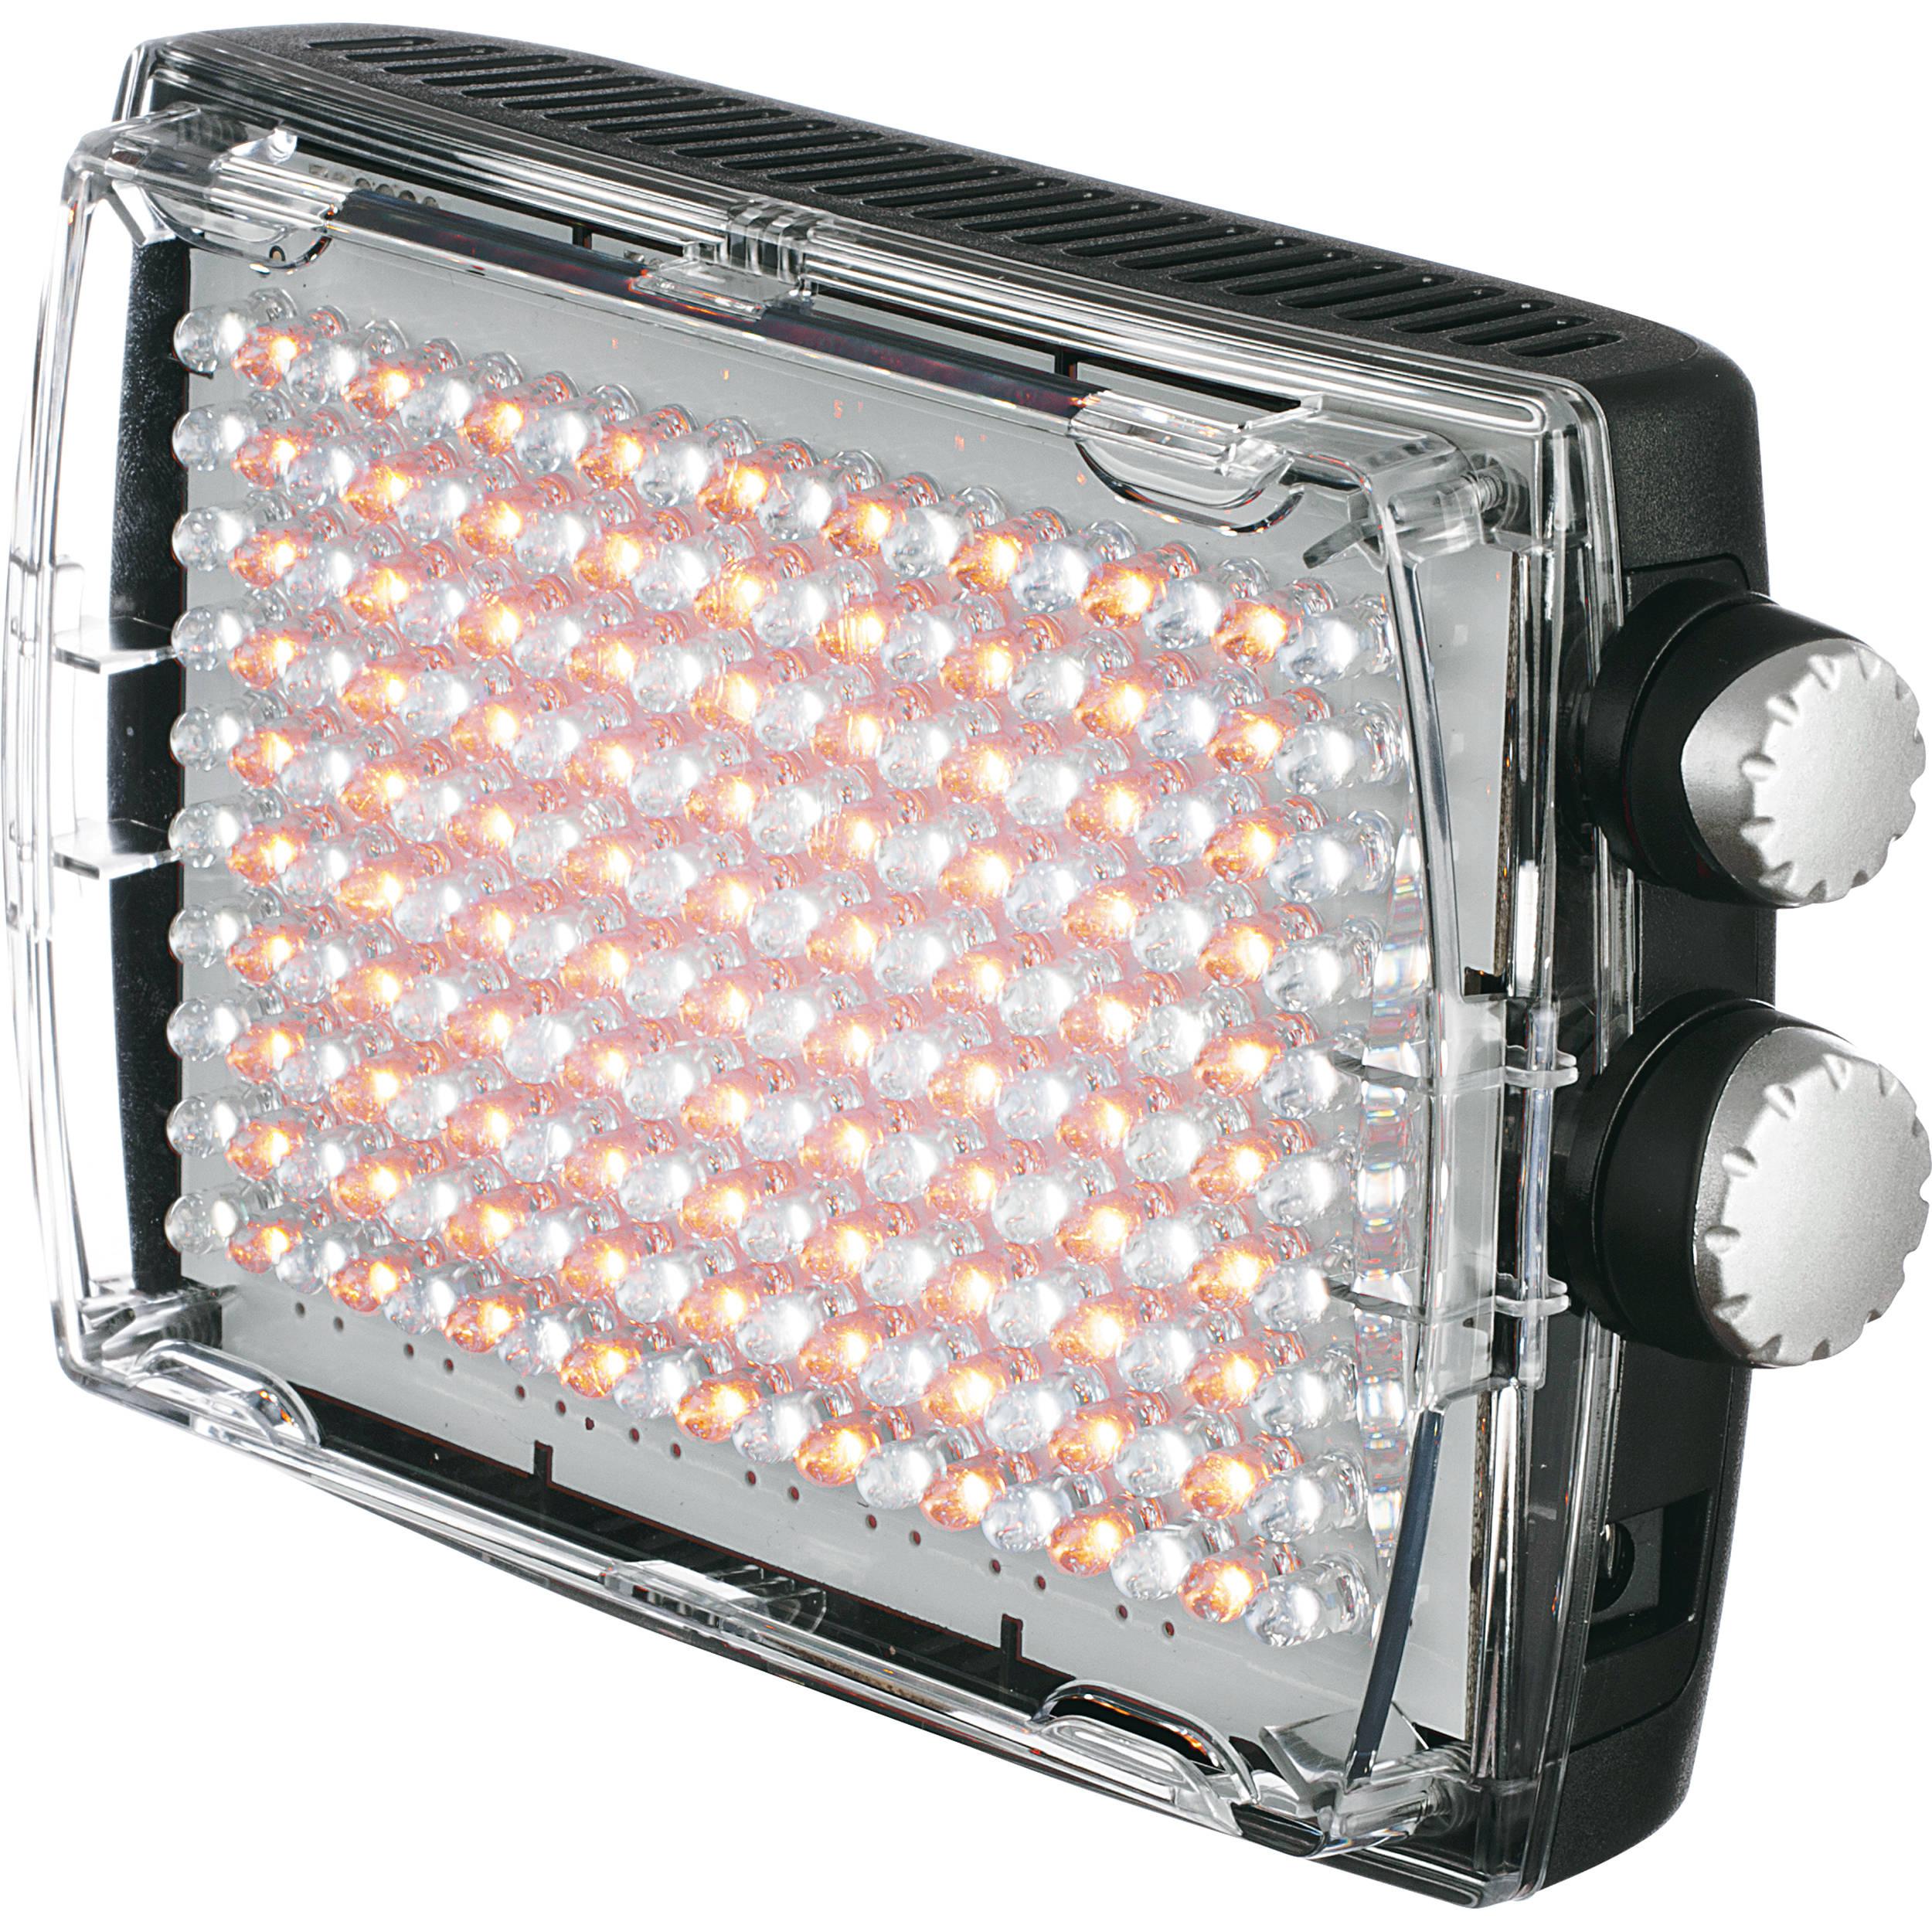 Lights Battery Powered